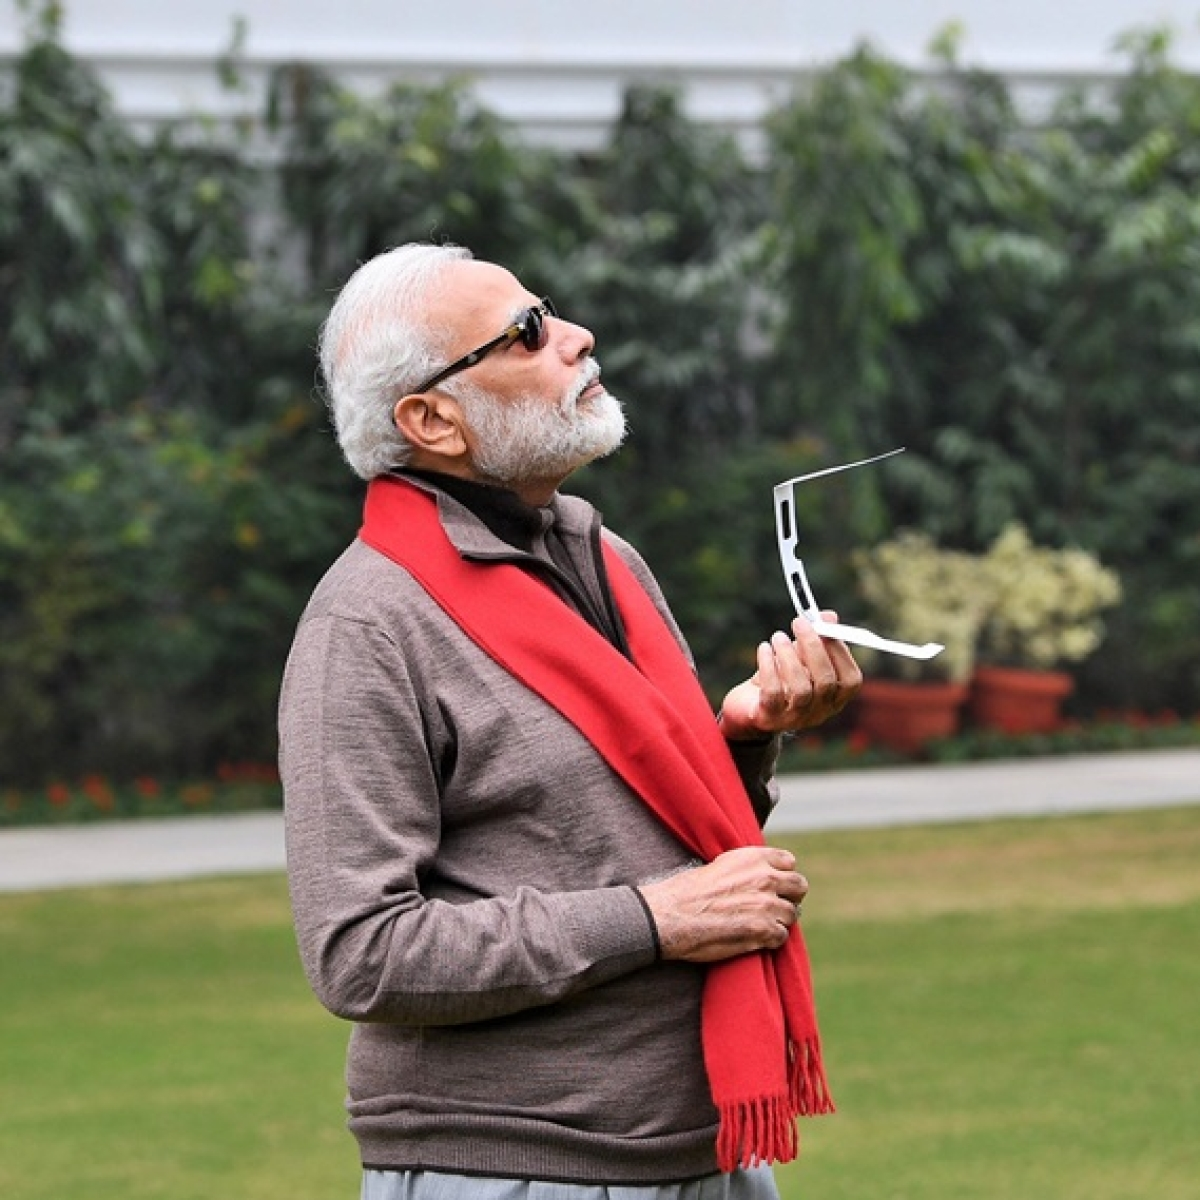 #BrandedFakeer: Twitter trolls PM Modi for wearing sunglasses 'worth Rs 1.6 Lakh'